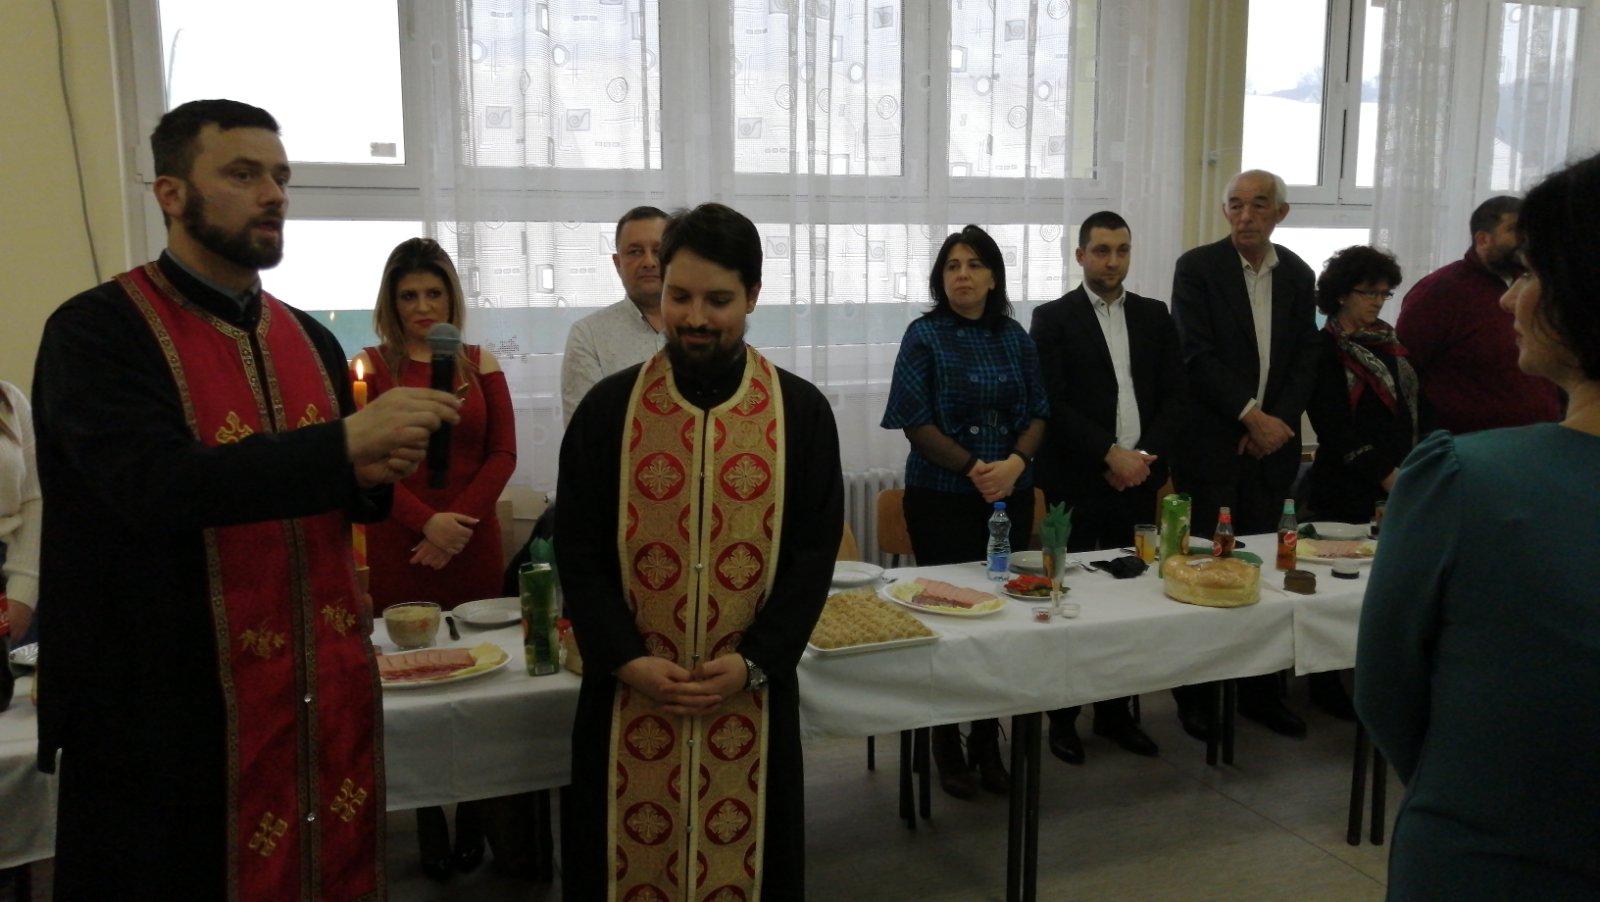 Proslava školske slave, foto: K.A.